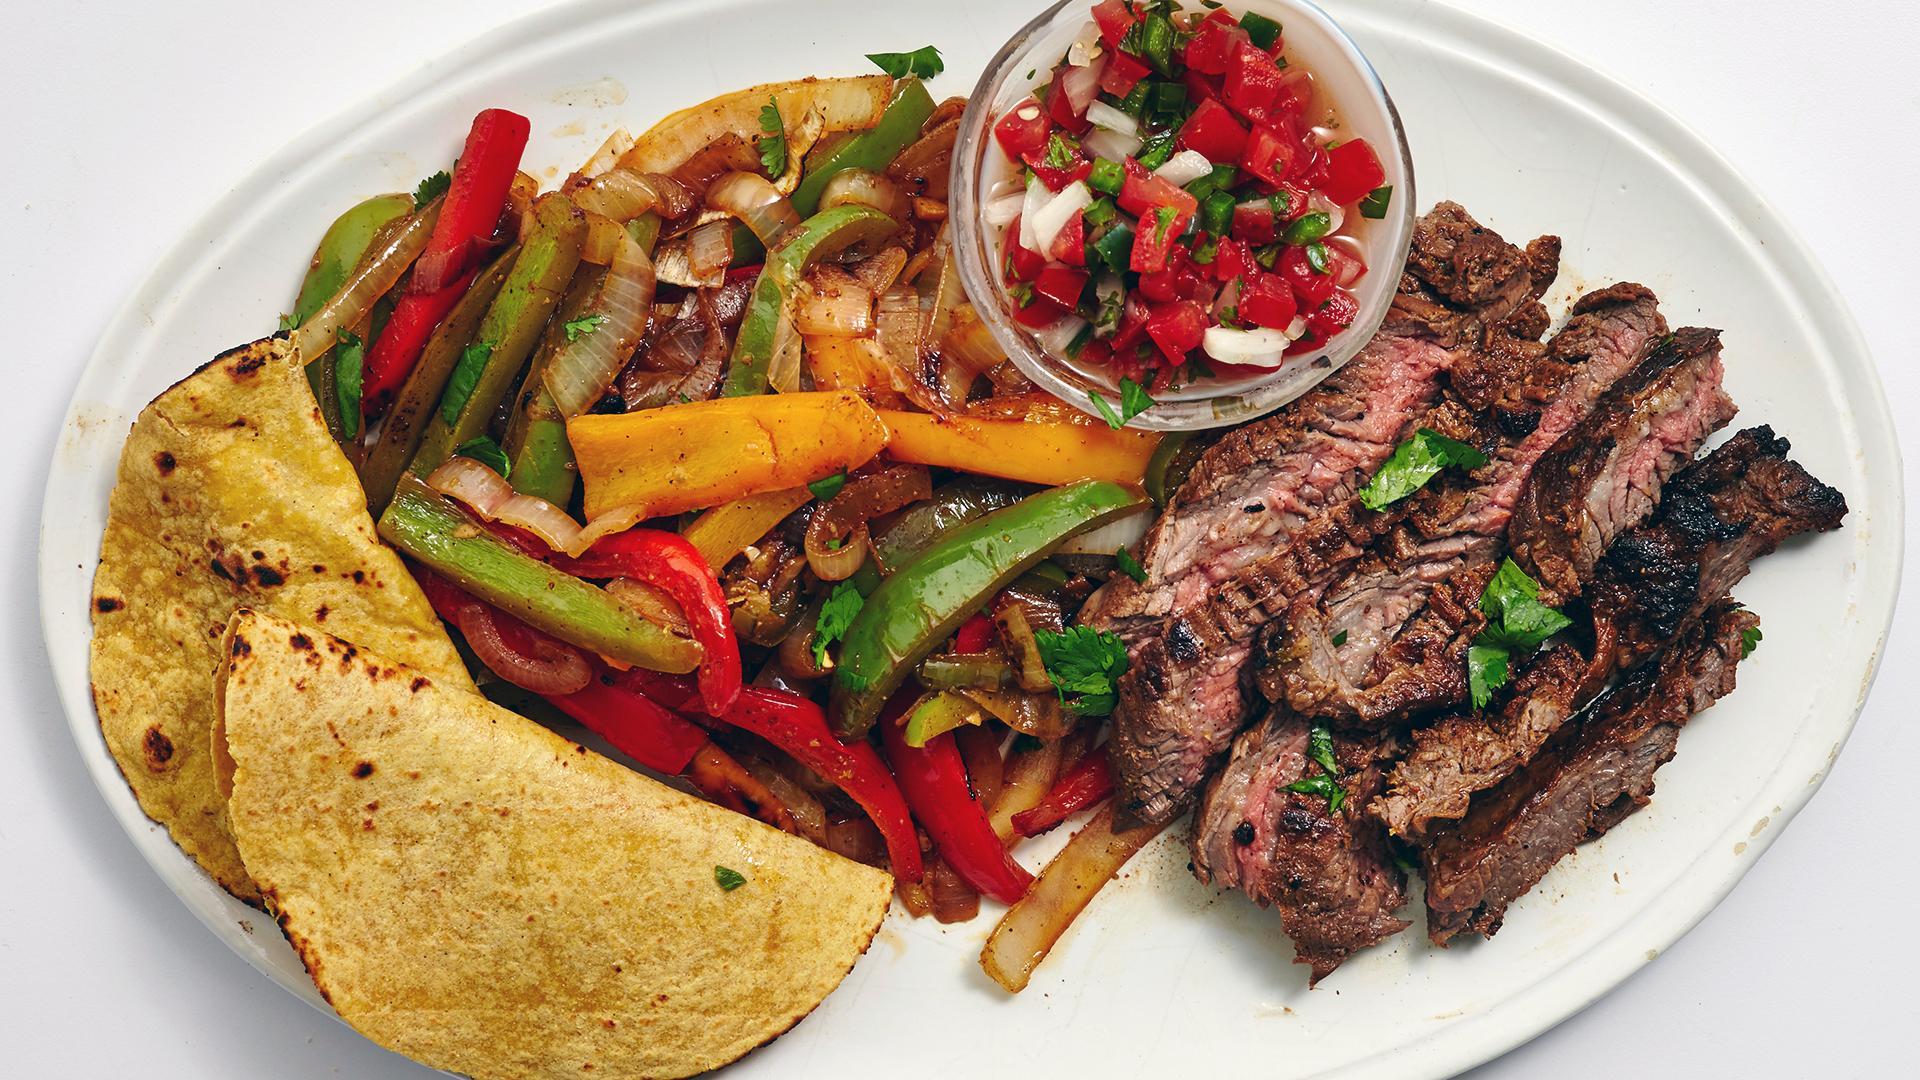 Best Steak Fajitas